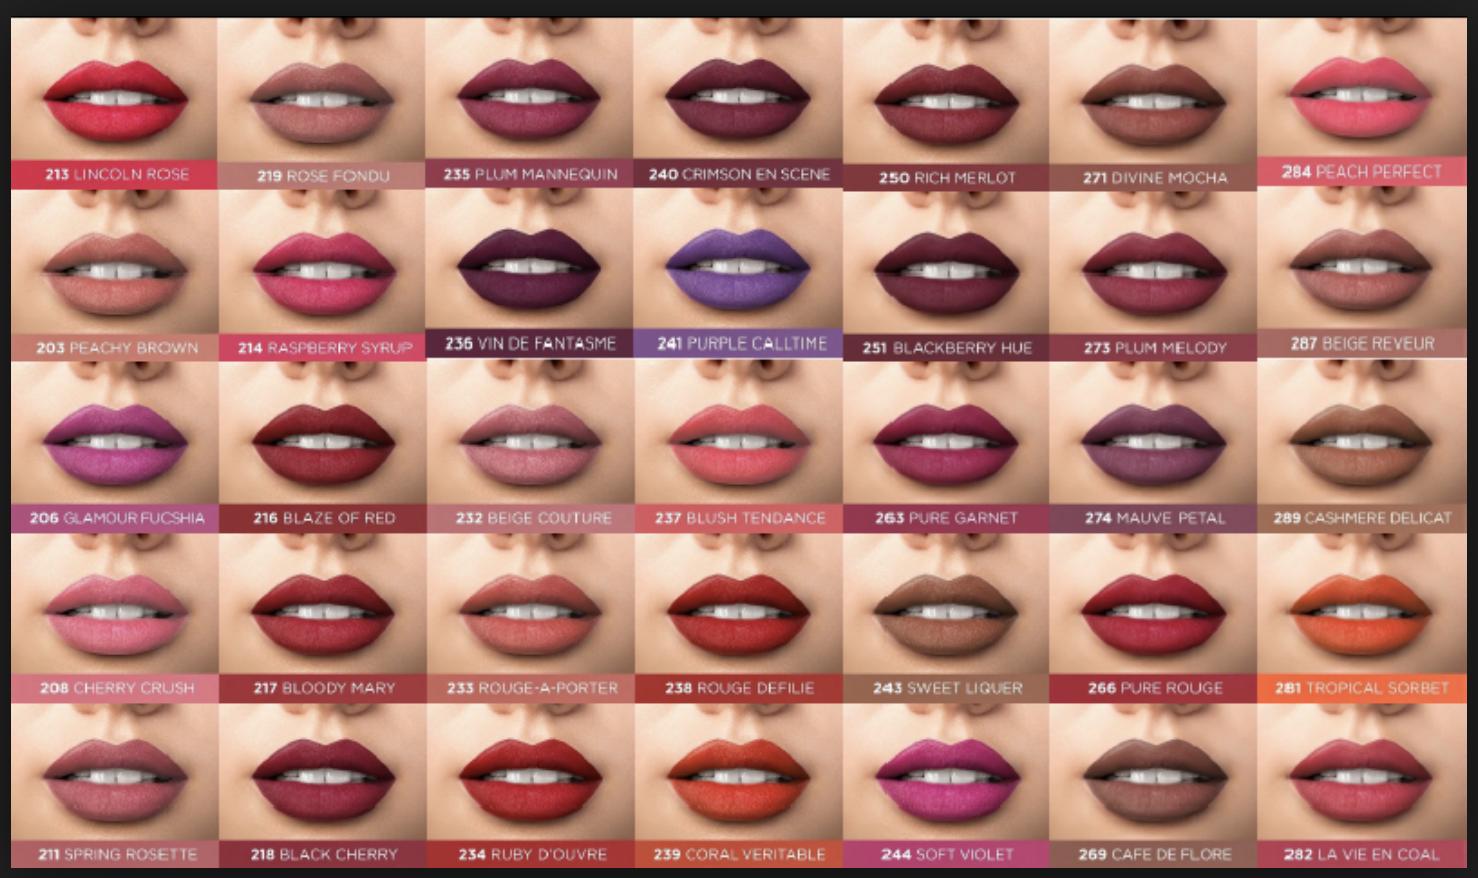 Lipstick For Brown Skin Archives Ankita Sodhia Bangkok Based Digital Marketing Consultant And Lifestyle Blogger